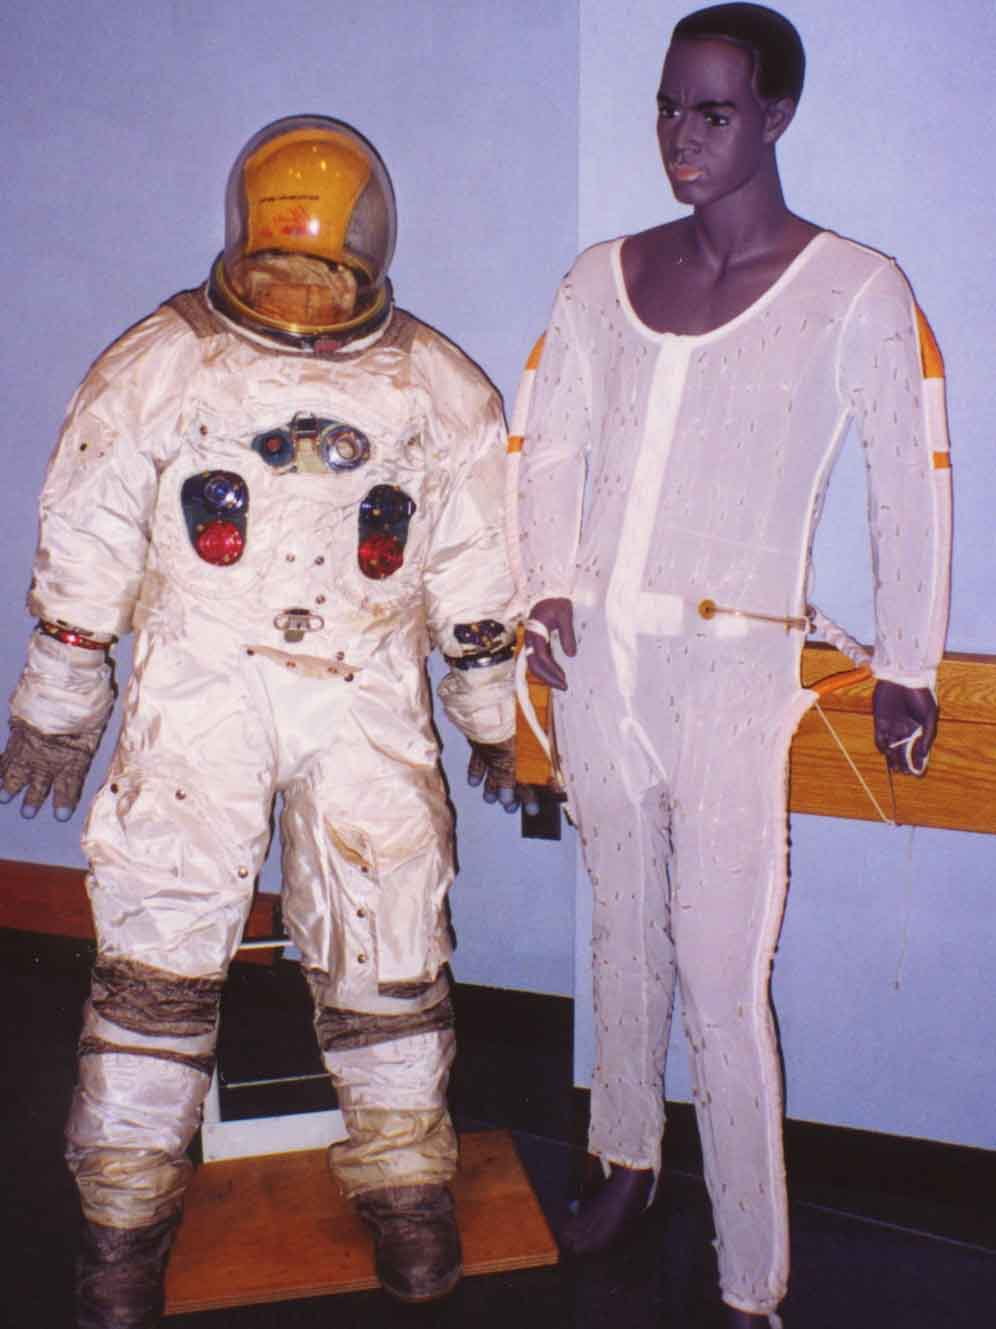 Astronaut gear